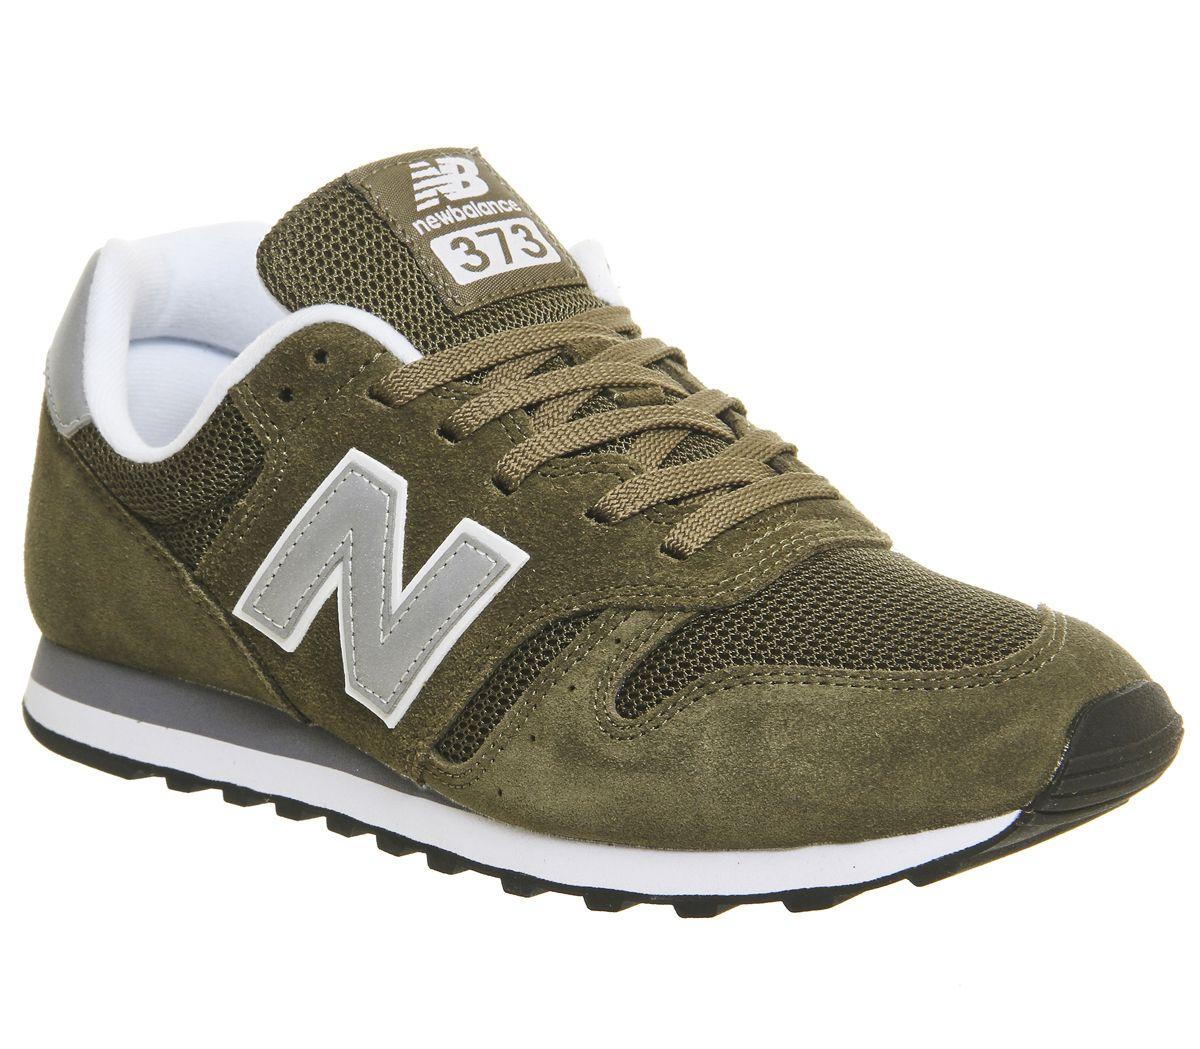 98df327528 New Balance 373 Olive Silver - Unisex Sportschuhe